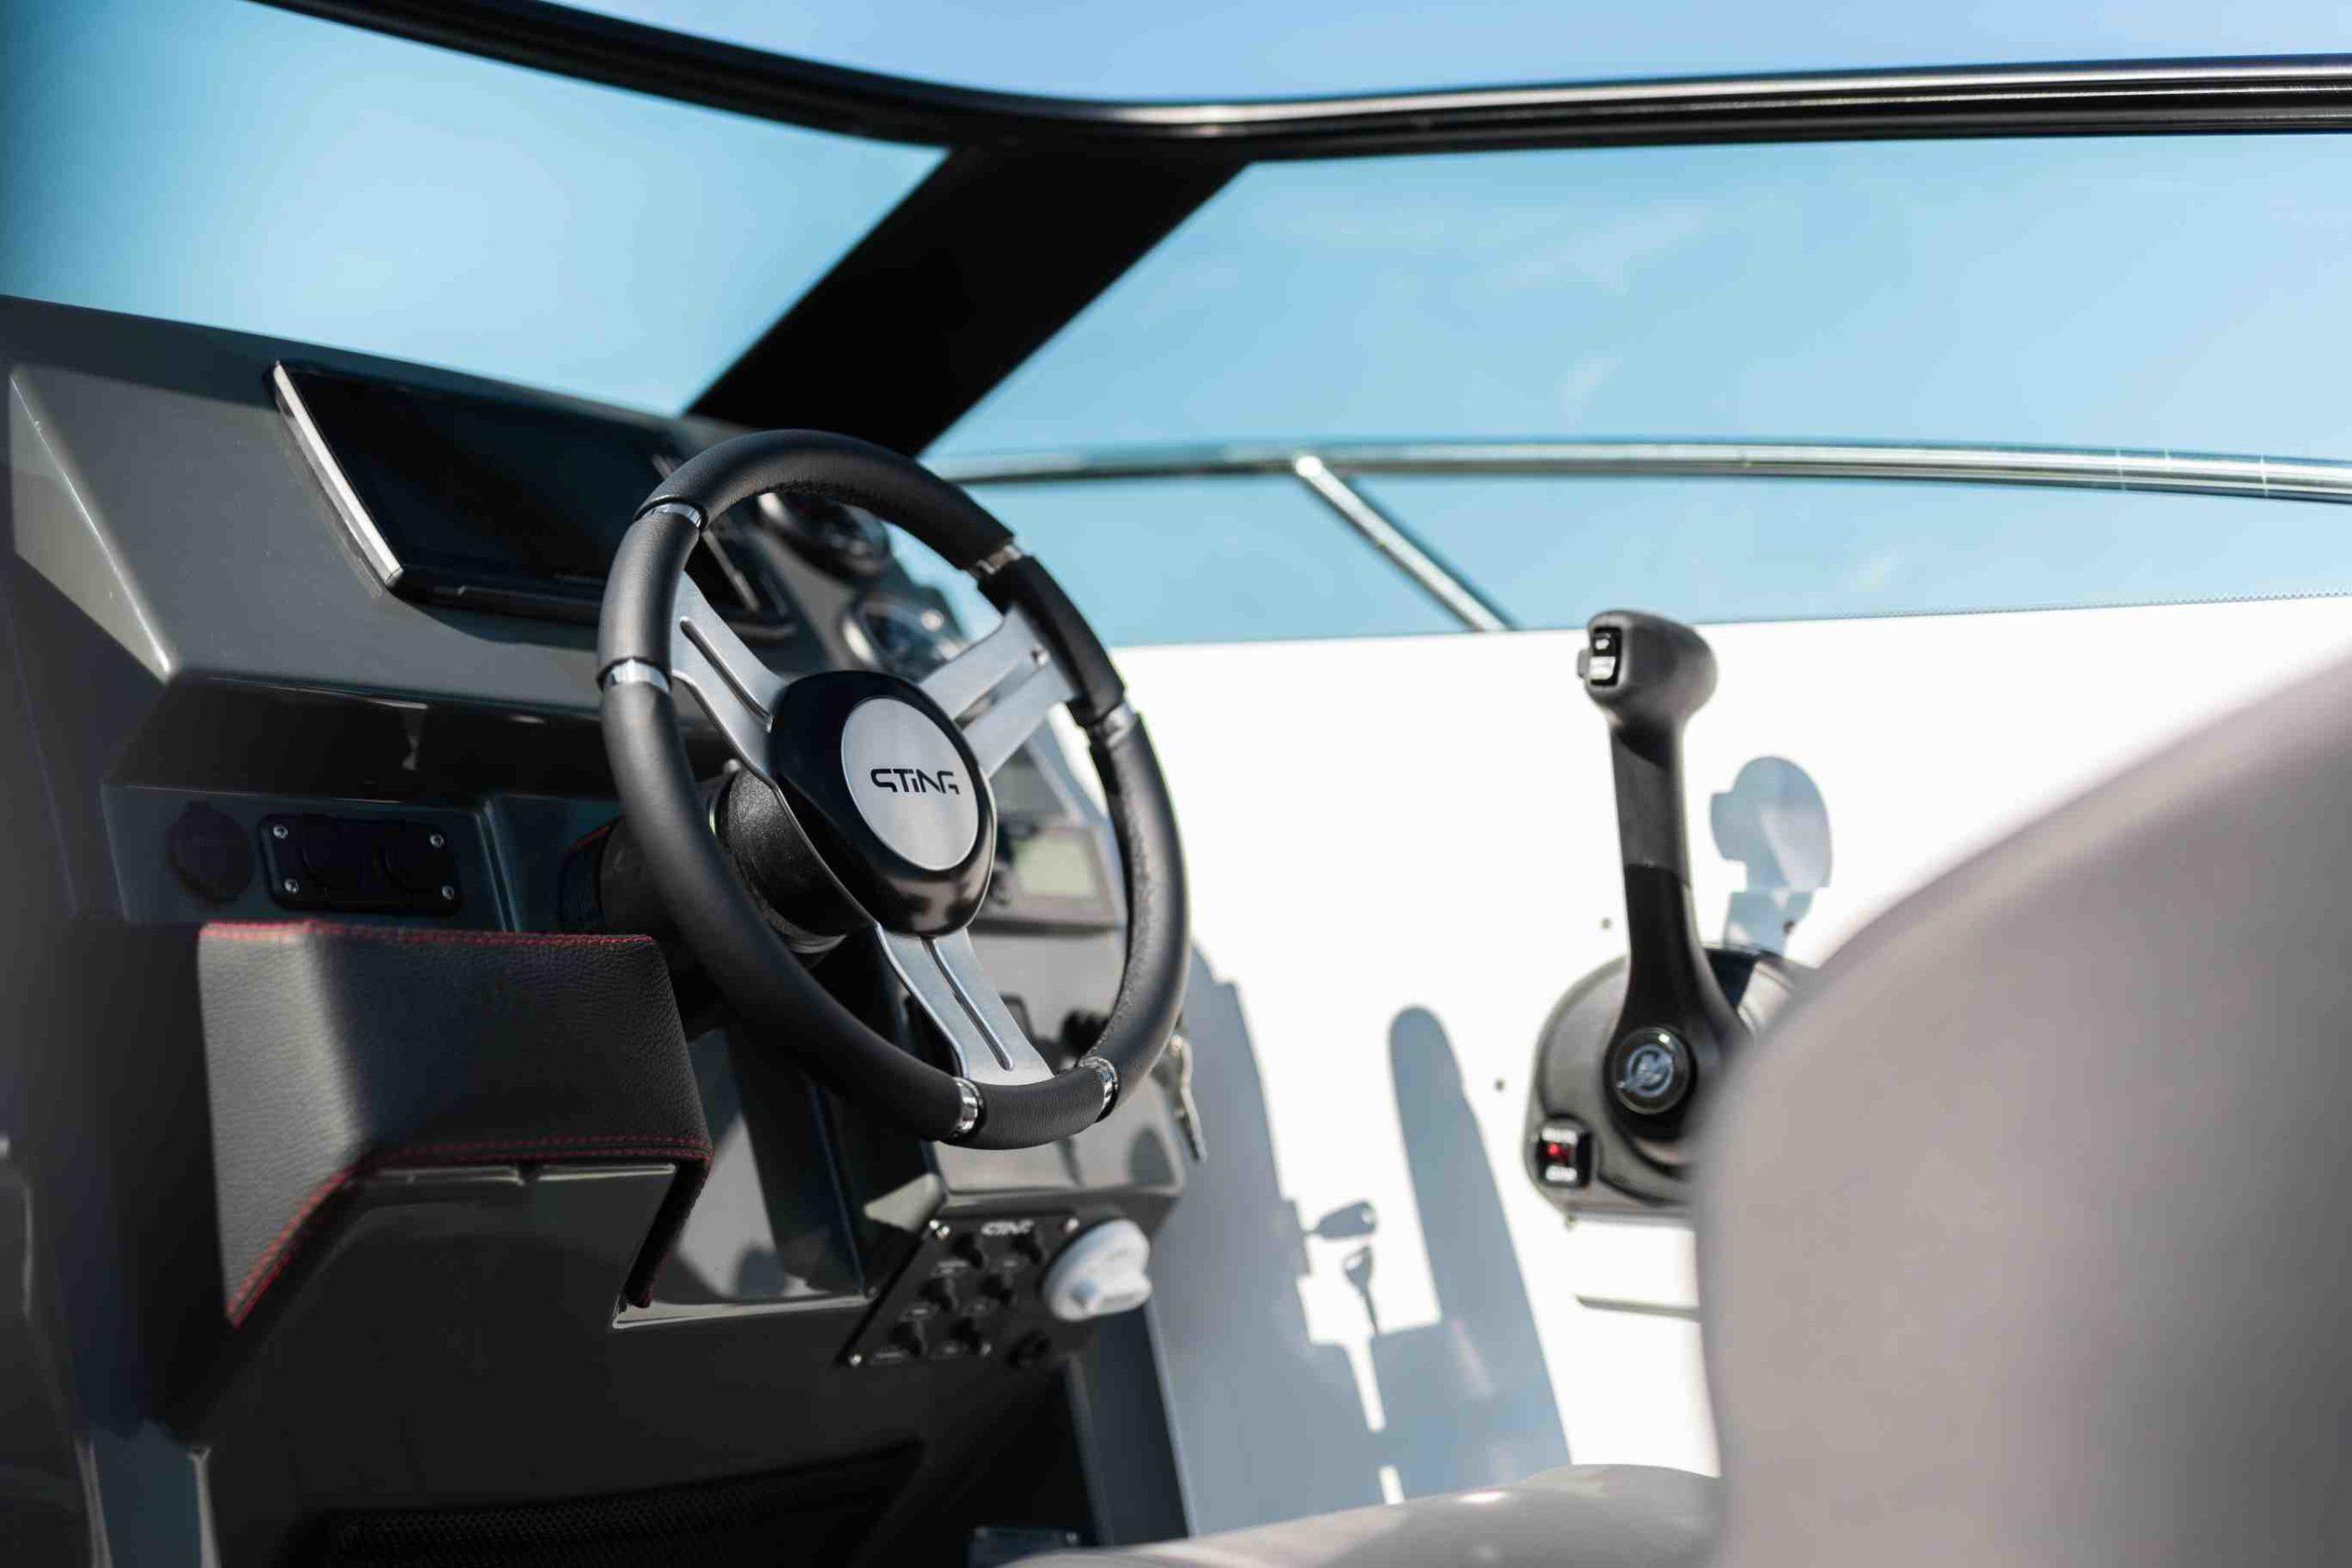 Sting 610 DC details - cockpit